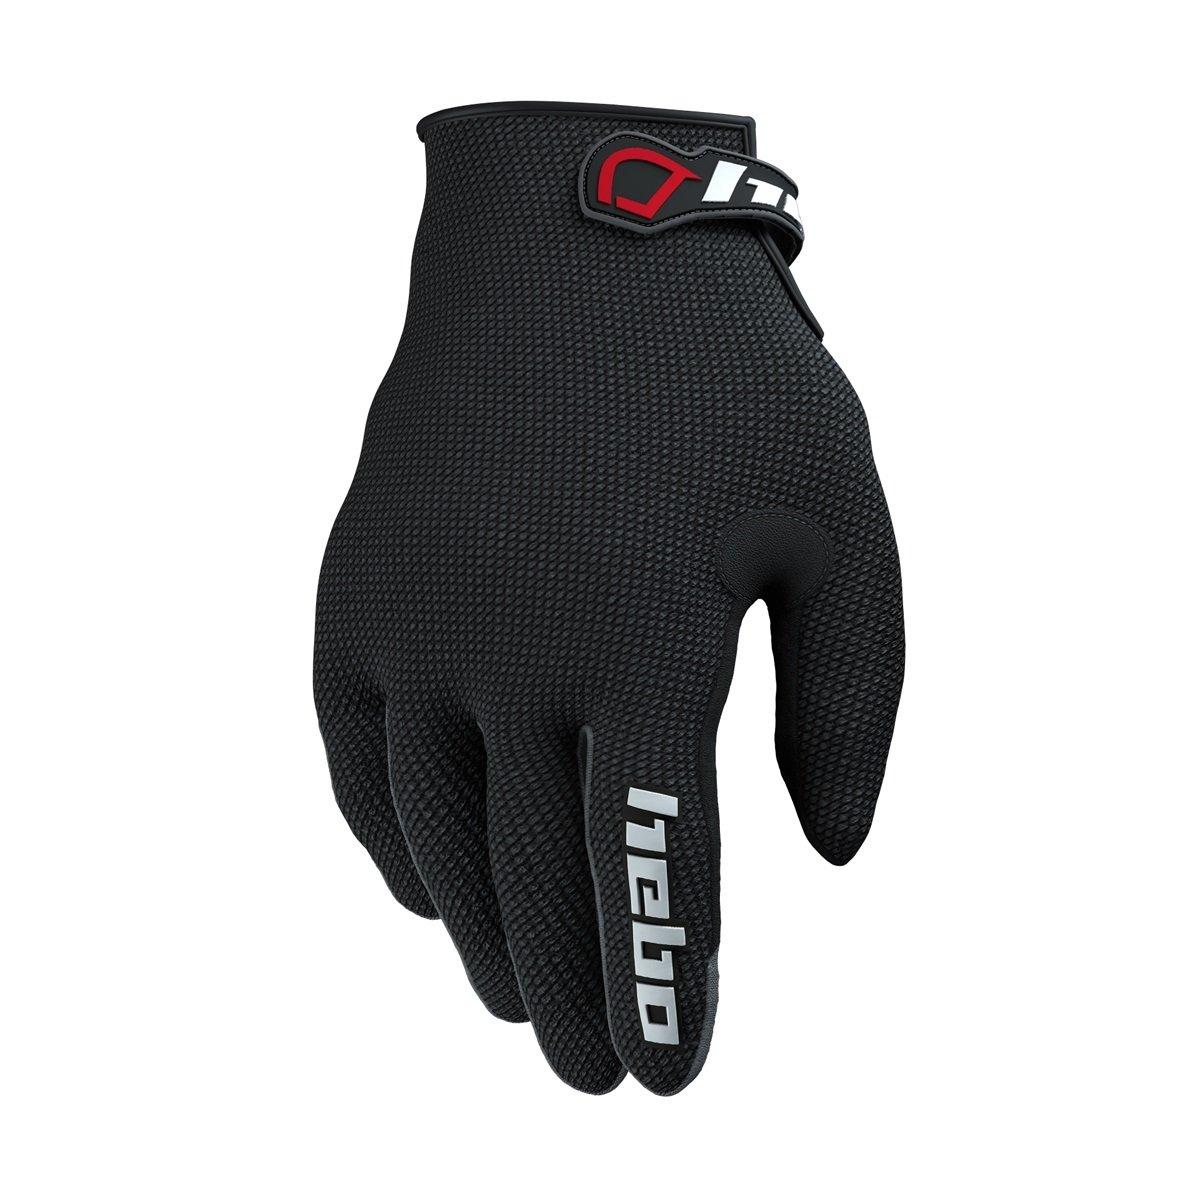 Hebo he1156nl Trial Team II Gloves, Black, Size L HEBOLUTION PARTS SLU